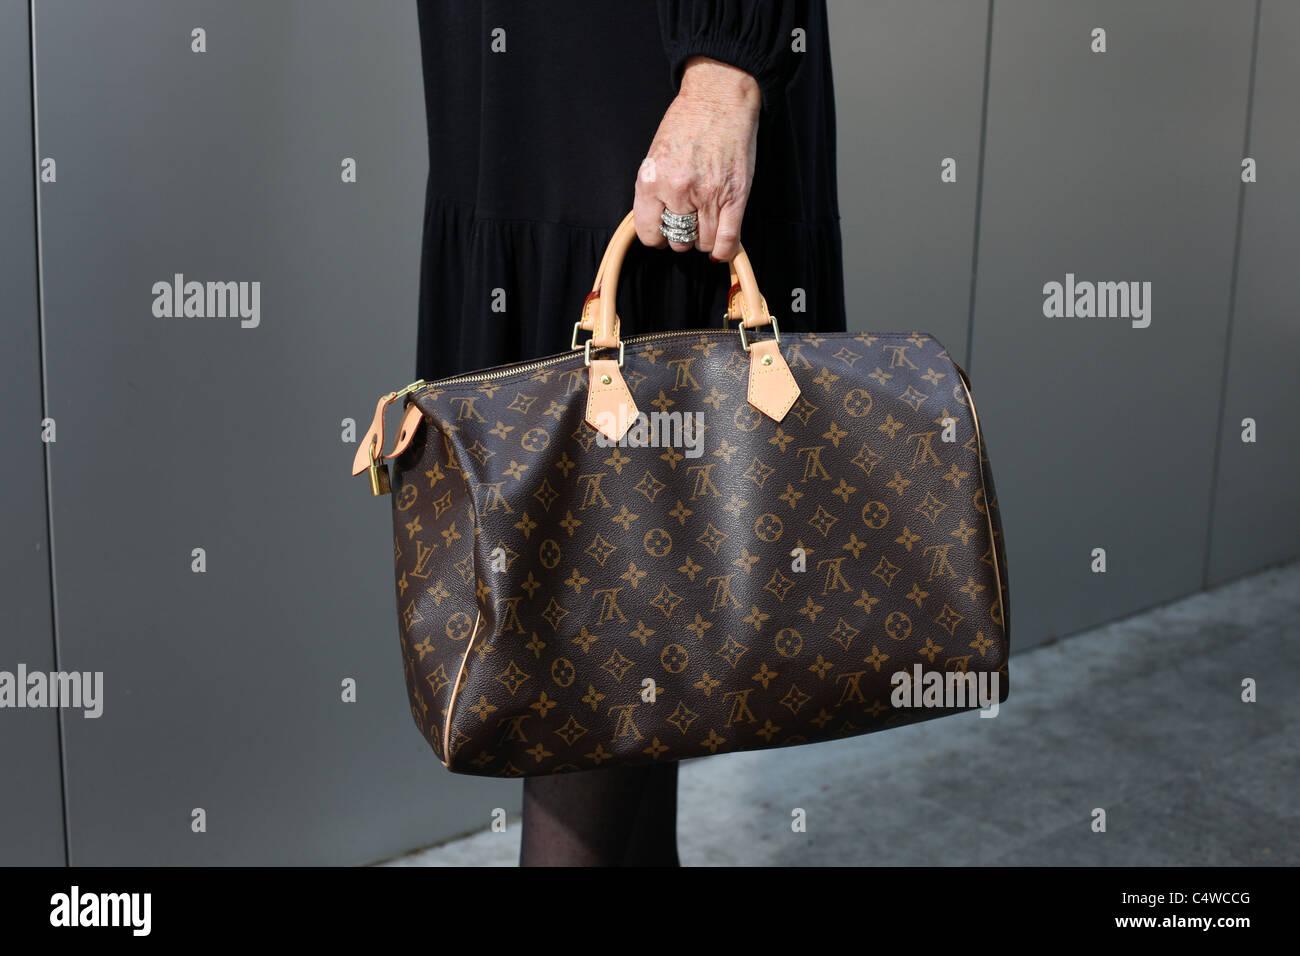 9286f267e1704 Louis Vuitton Tasche Stockfotos   Louis Vuitton Tasche Bilder - Alamy